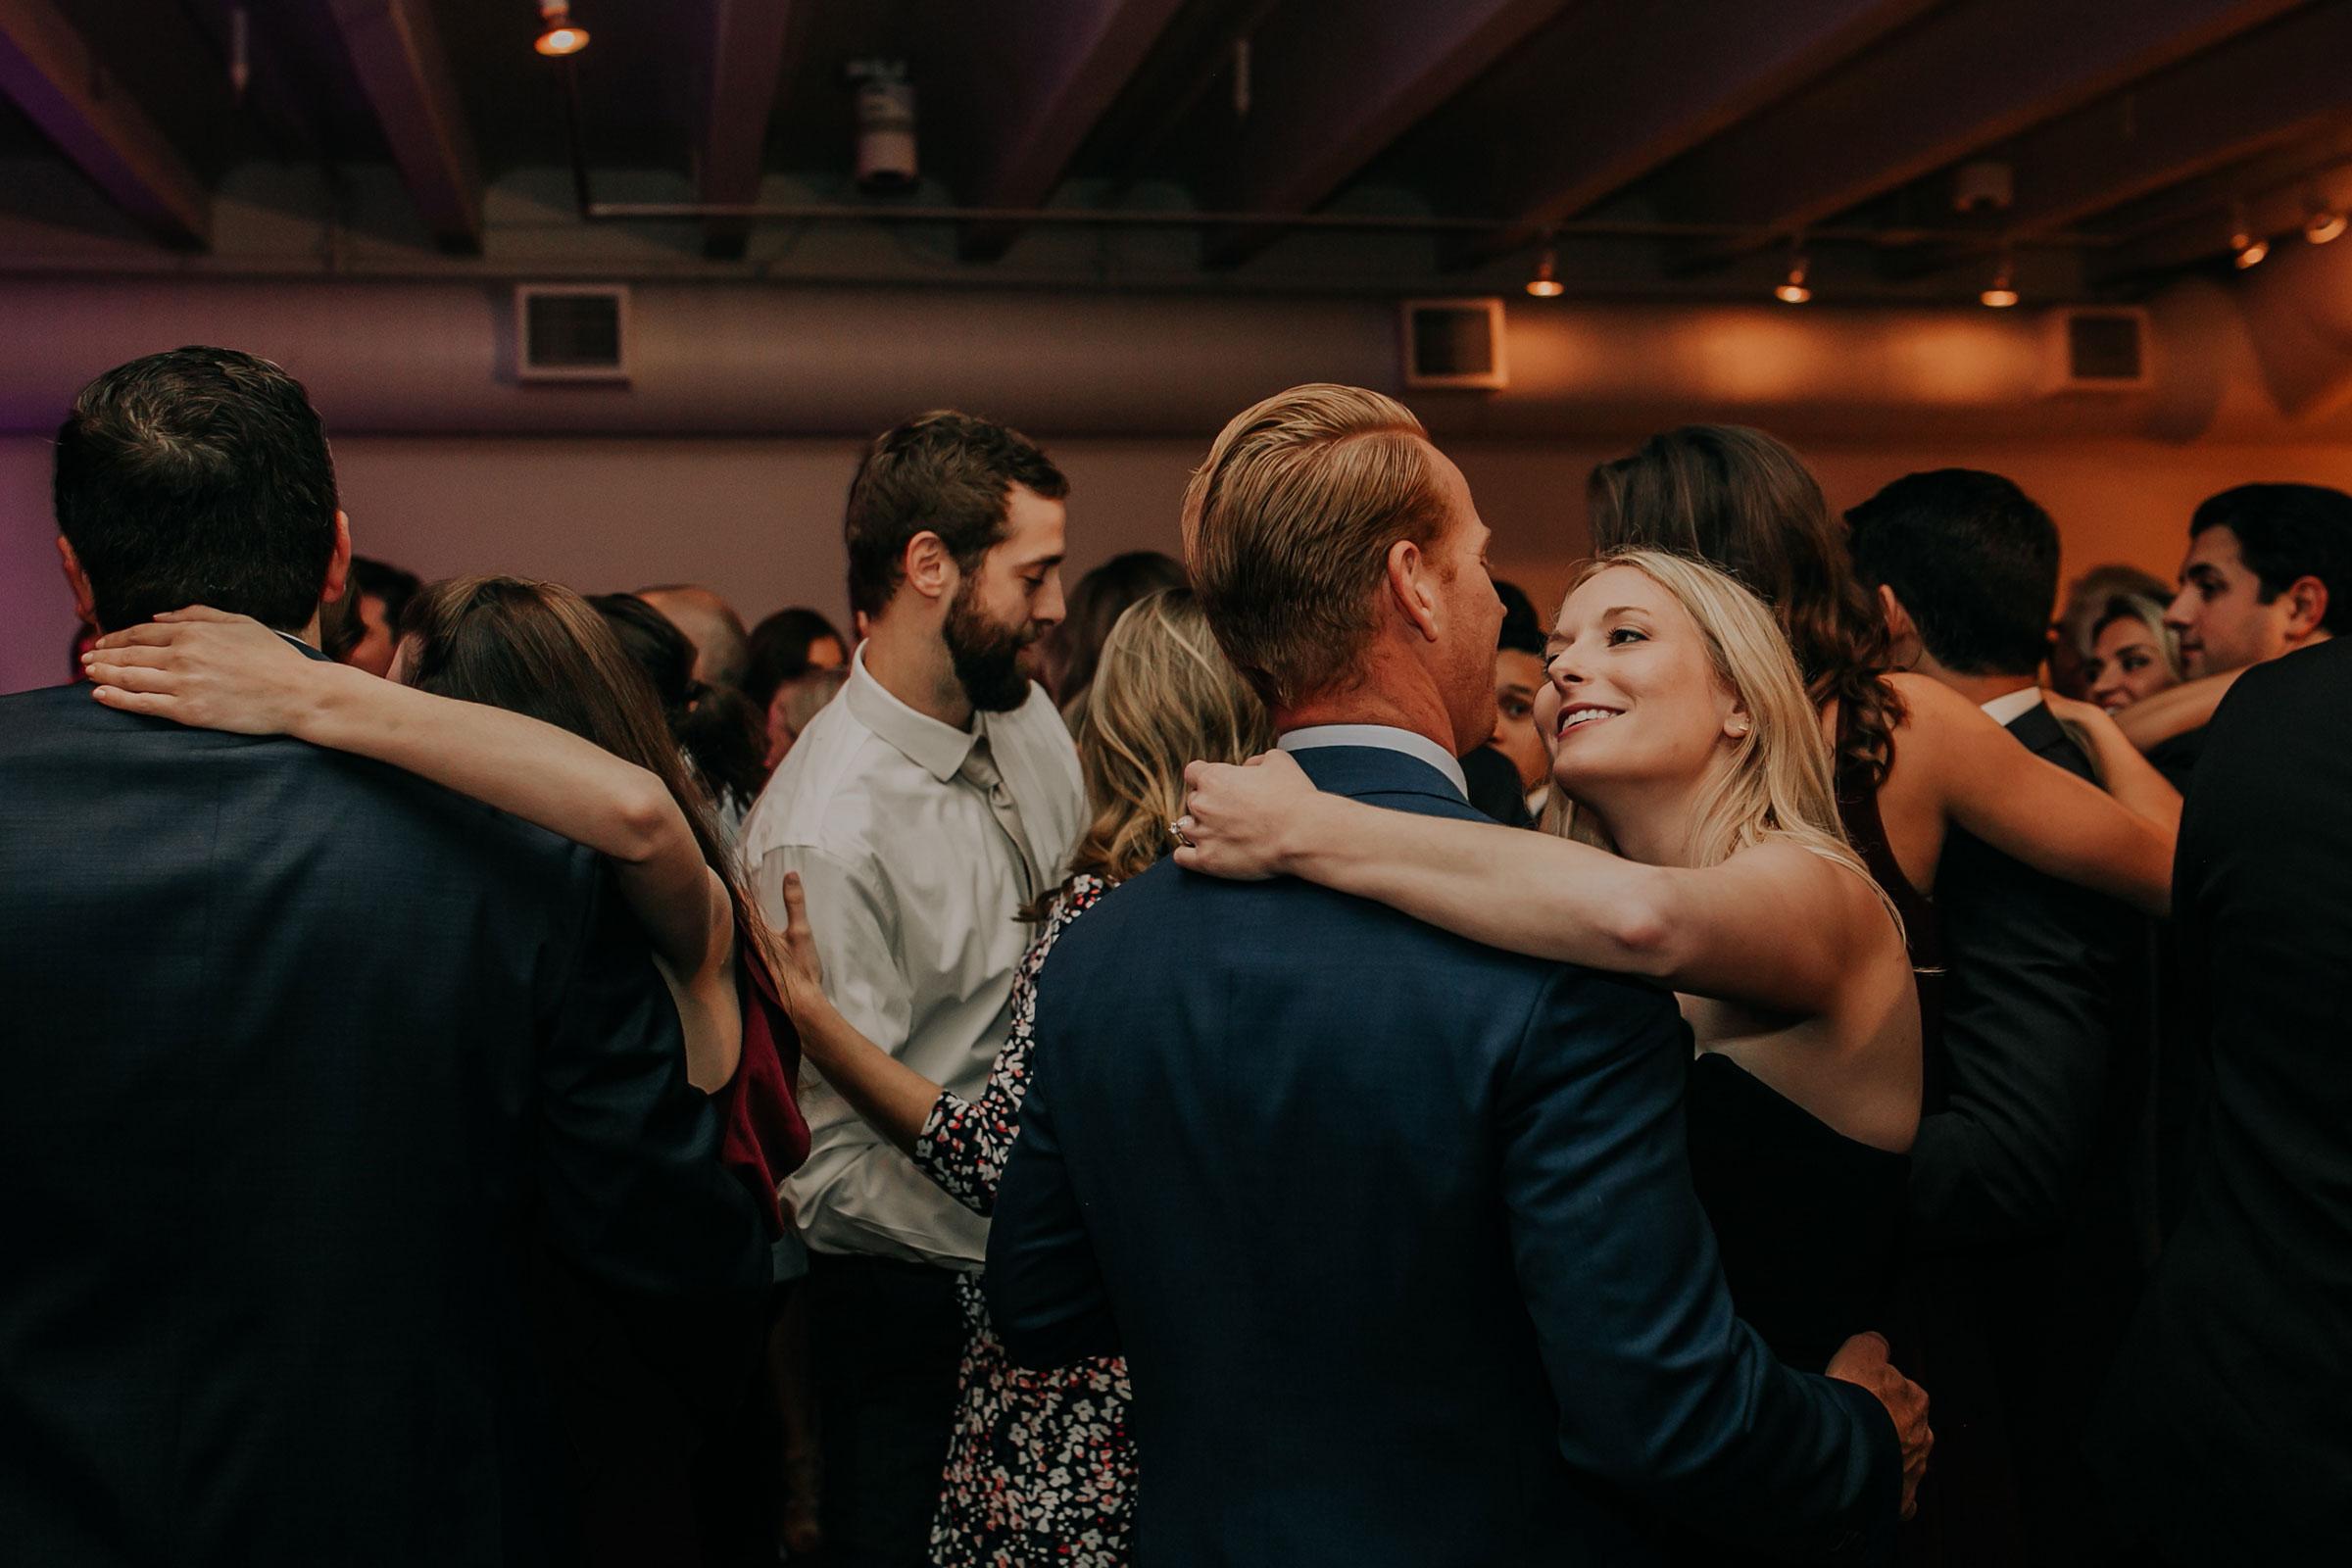 guests-slow-dancing-founders-one-nine-omaha-nebraska-raelyn-ramey-photography.jpg